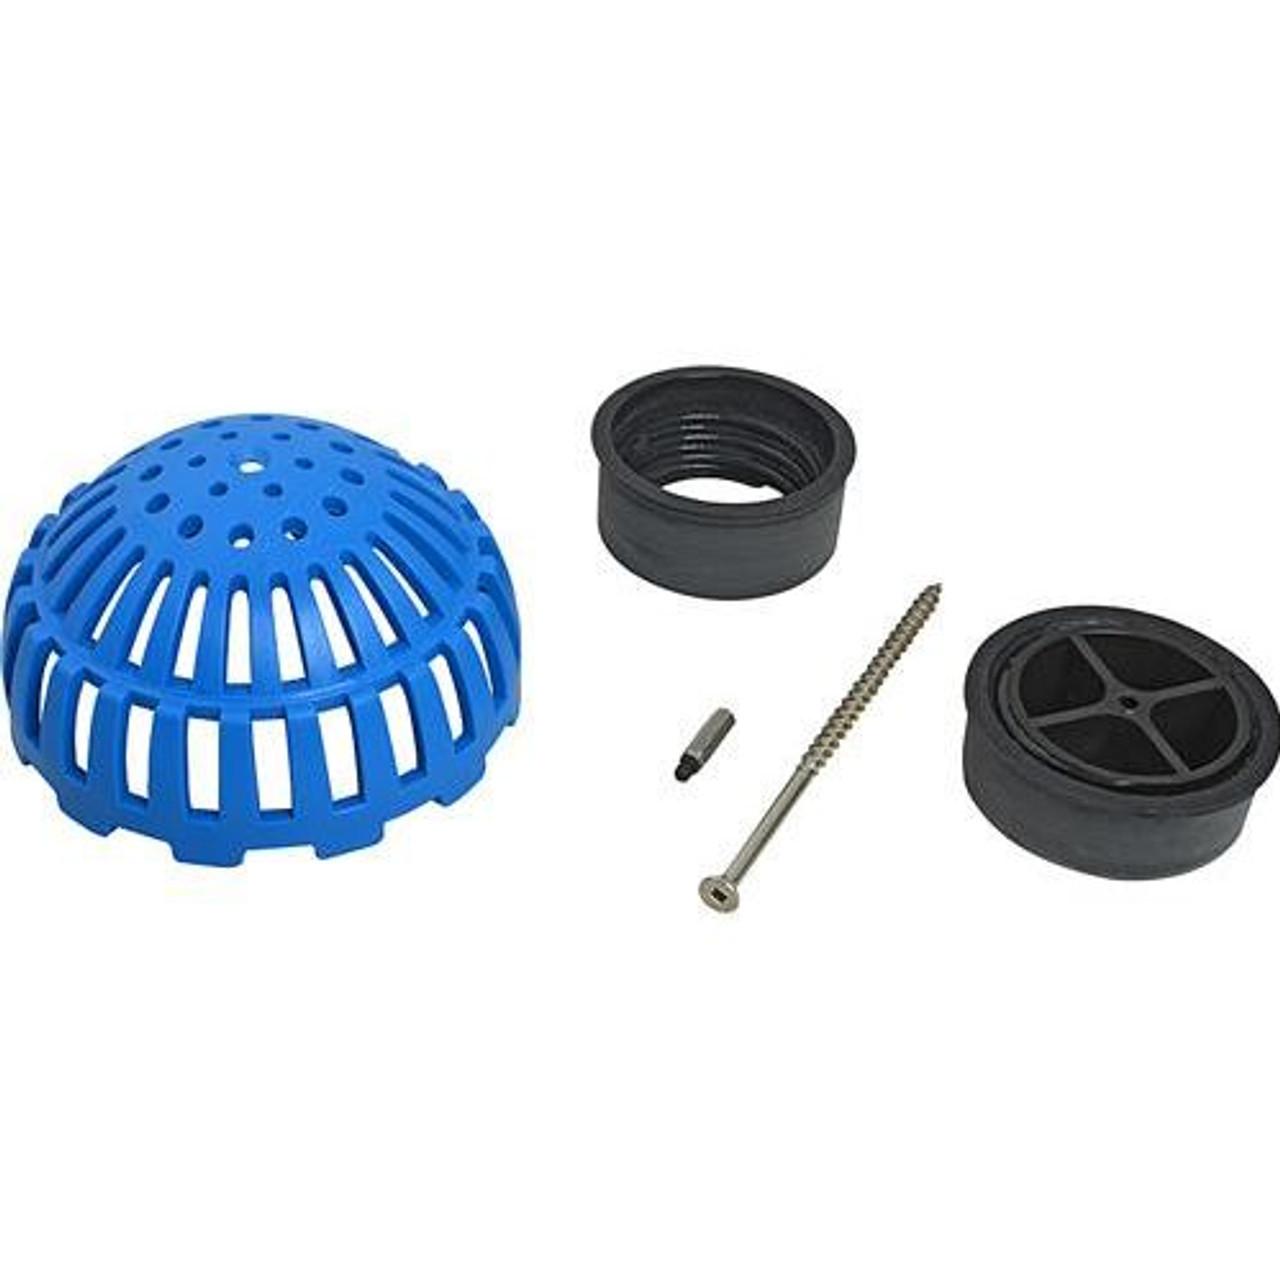 Locking Dome Strainer Kit - 3 inch